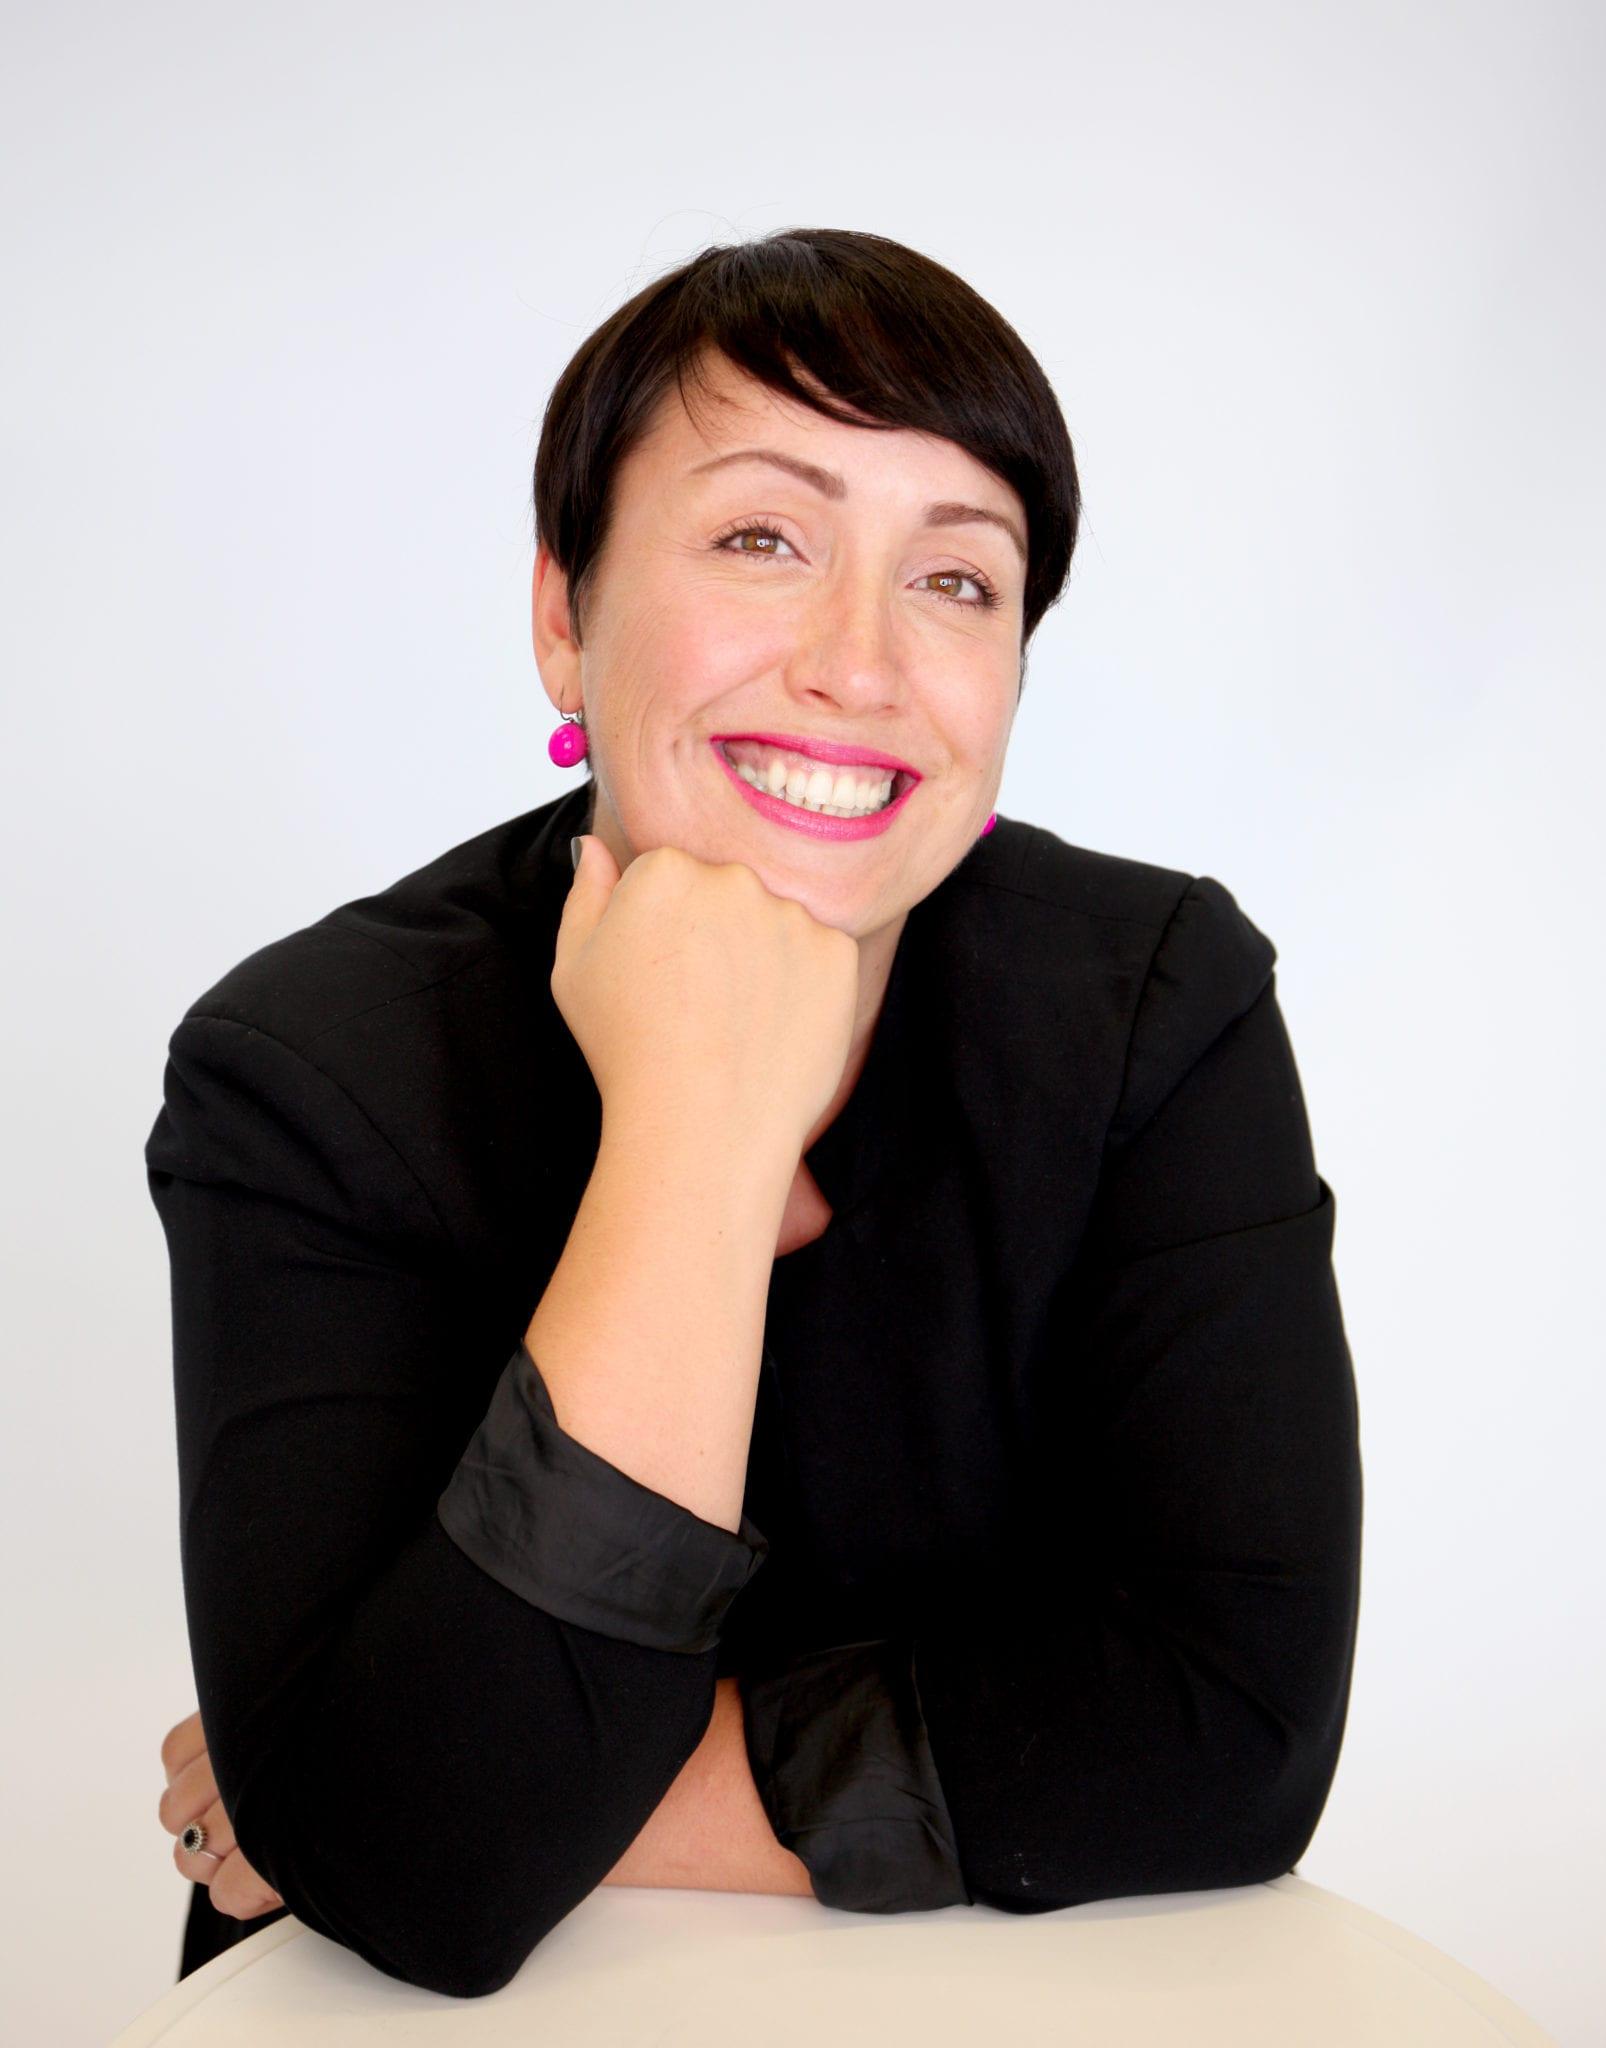 CEO Anne Zangolies